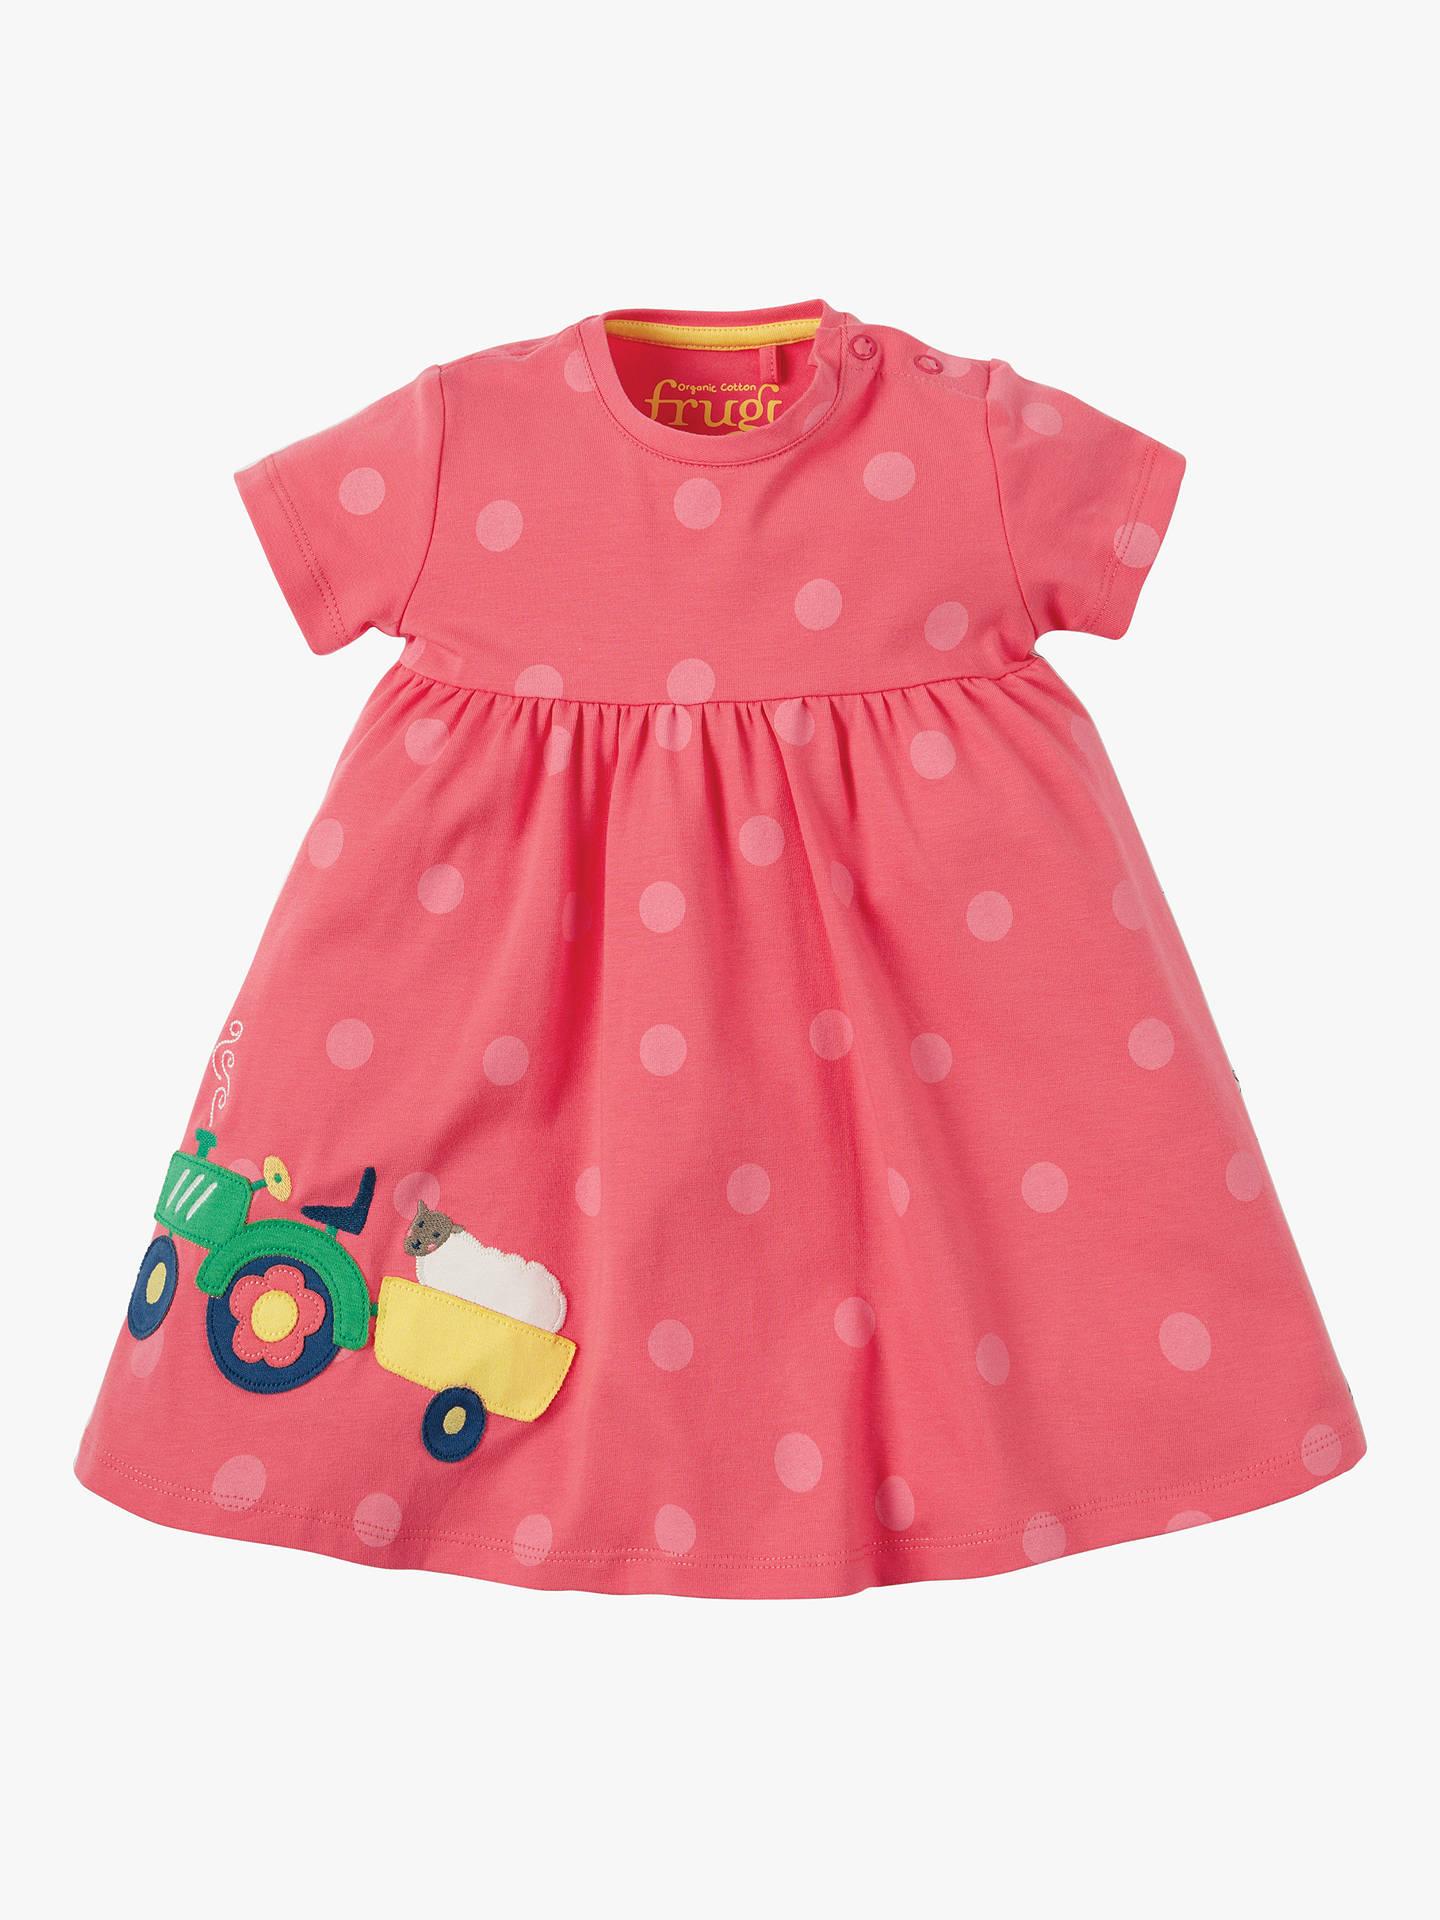 6163342a4 Frugi Baby Organic Cotton Tractor Spot Dress